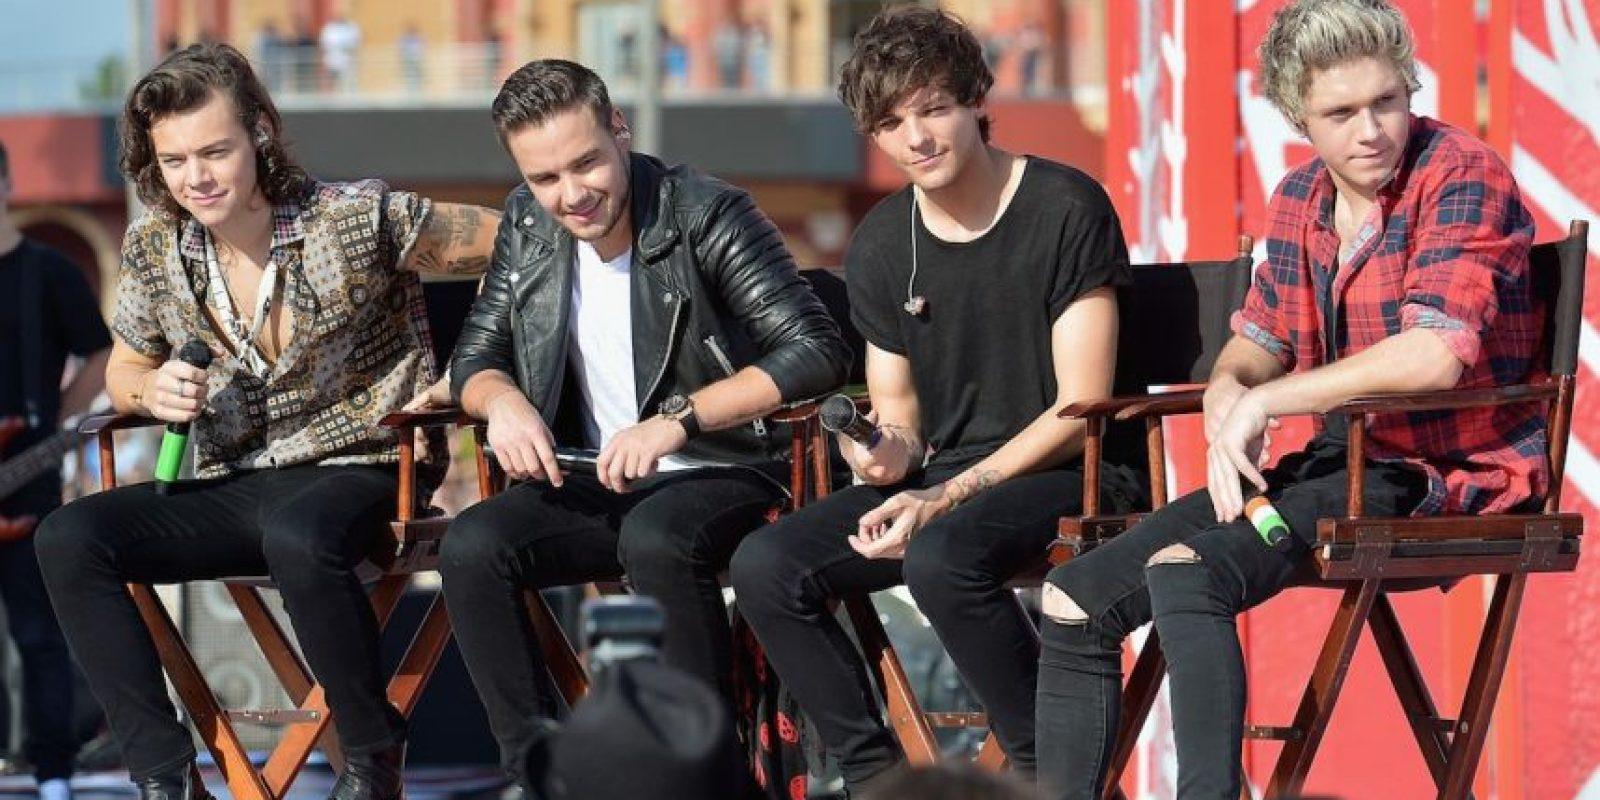 Tras la renuncia de Zayn Malik, la gira de One Direction se ha visto afectada. Foto:Getty Images